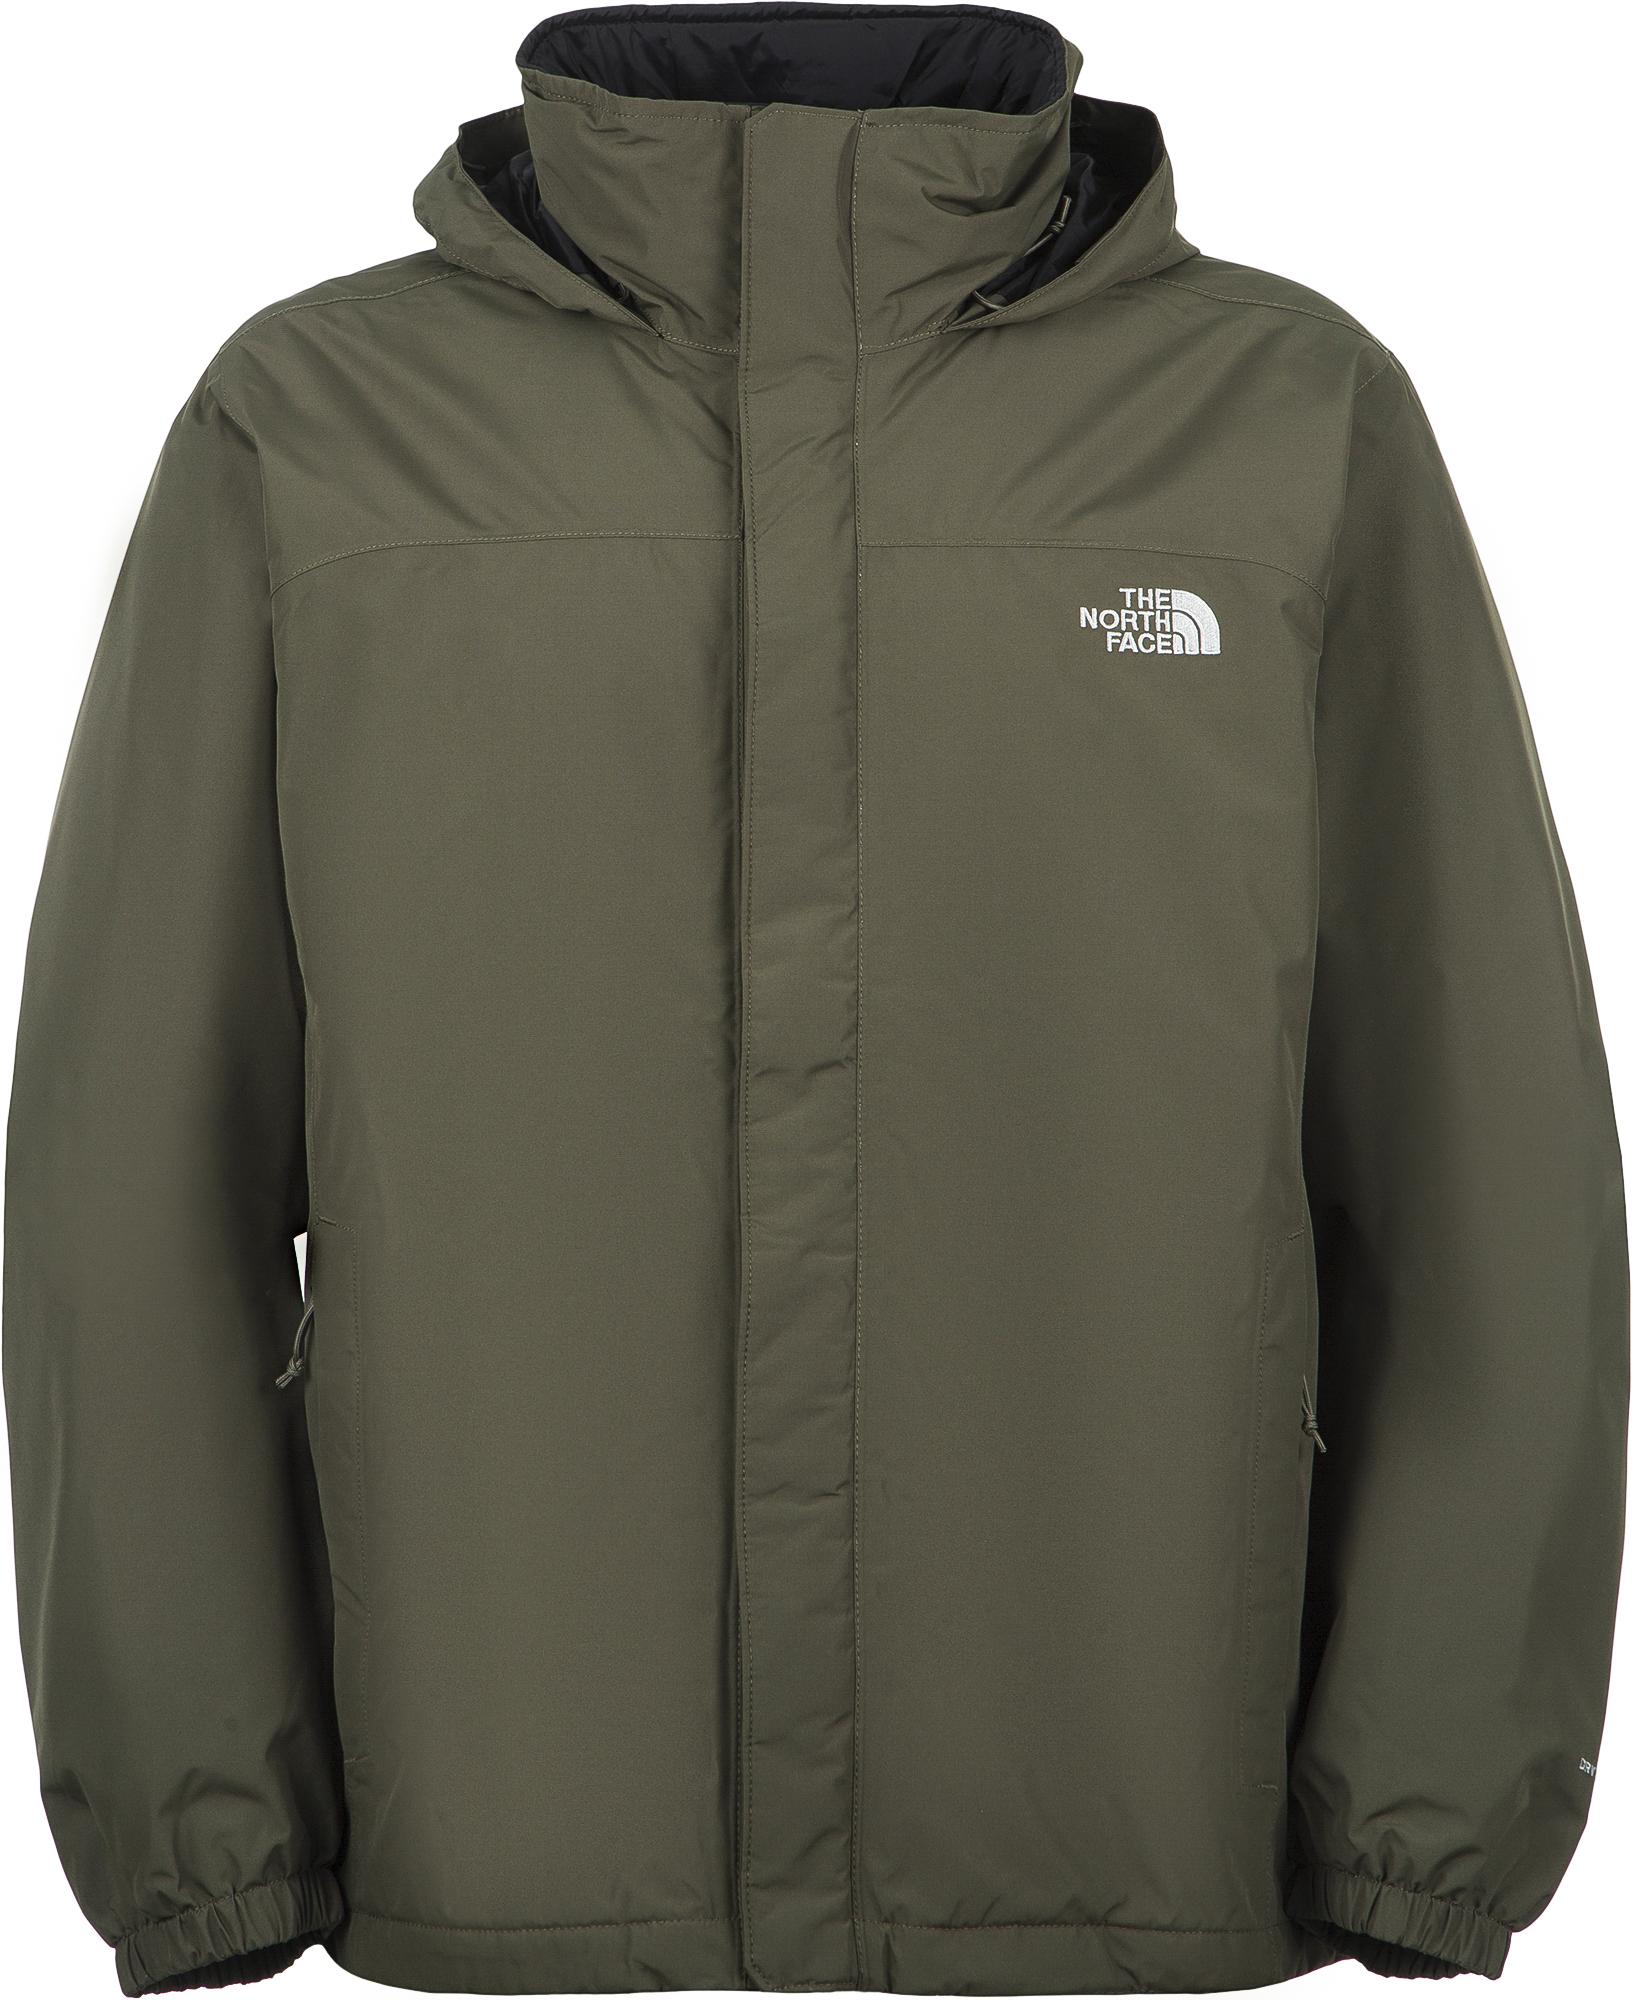 The North Face Куртка утепленная мужская The North Face Resolve Insulated, размер 44-46 недорого